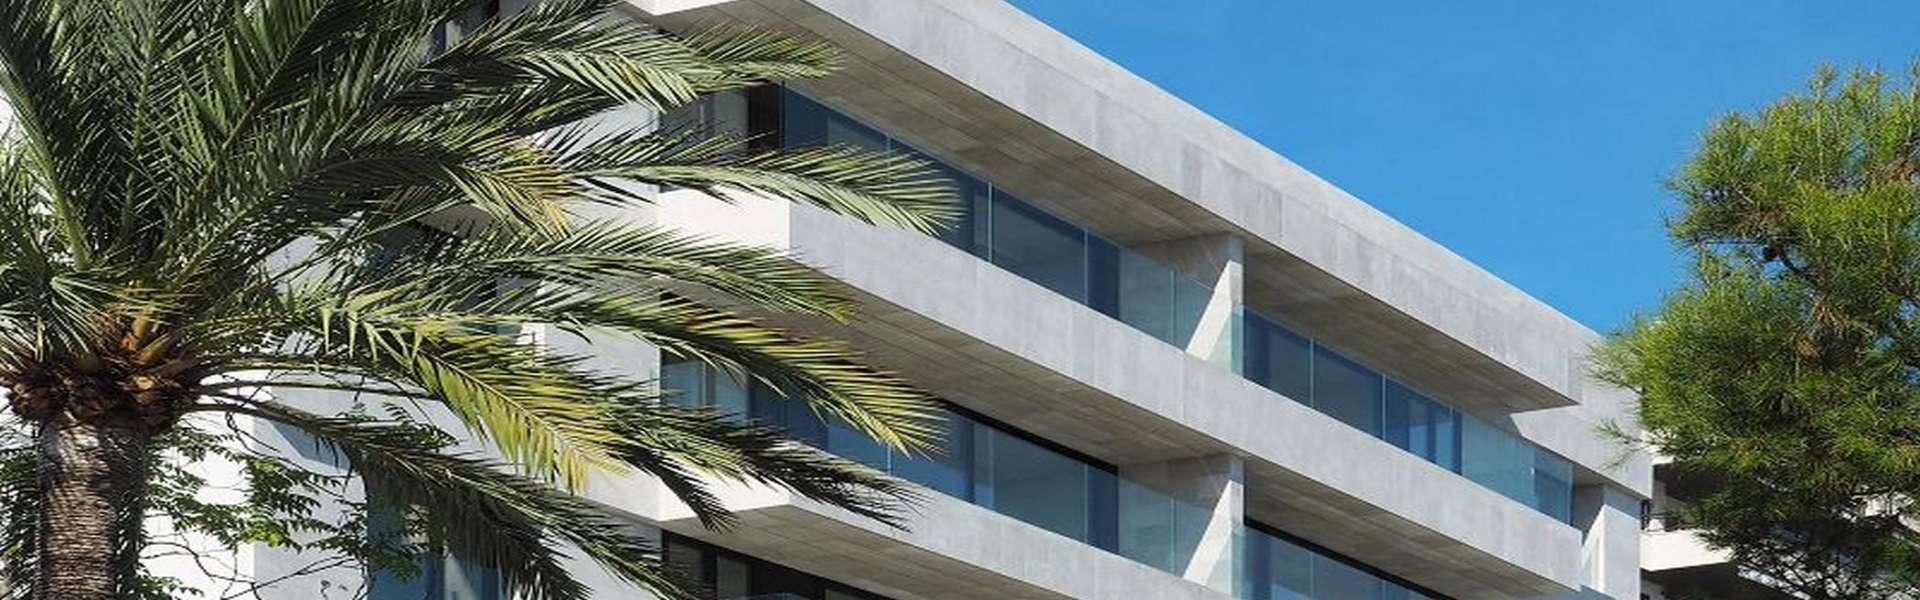 Palma/Paseo Marítimo - Luxury apartment on the port promenade